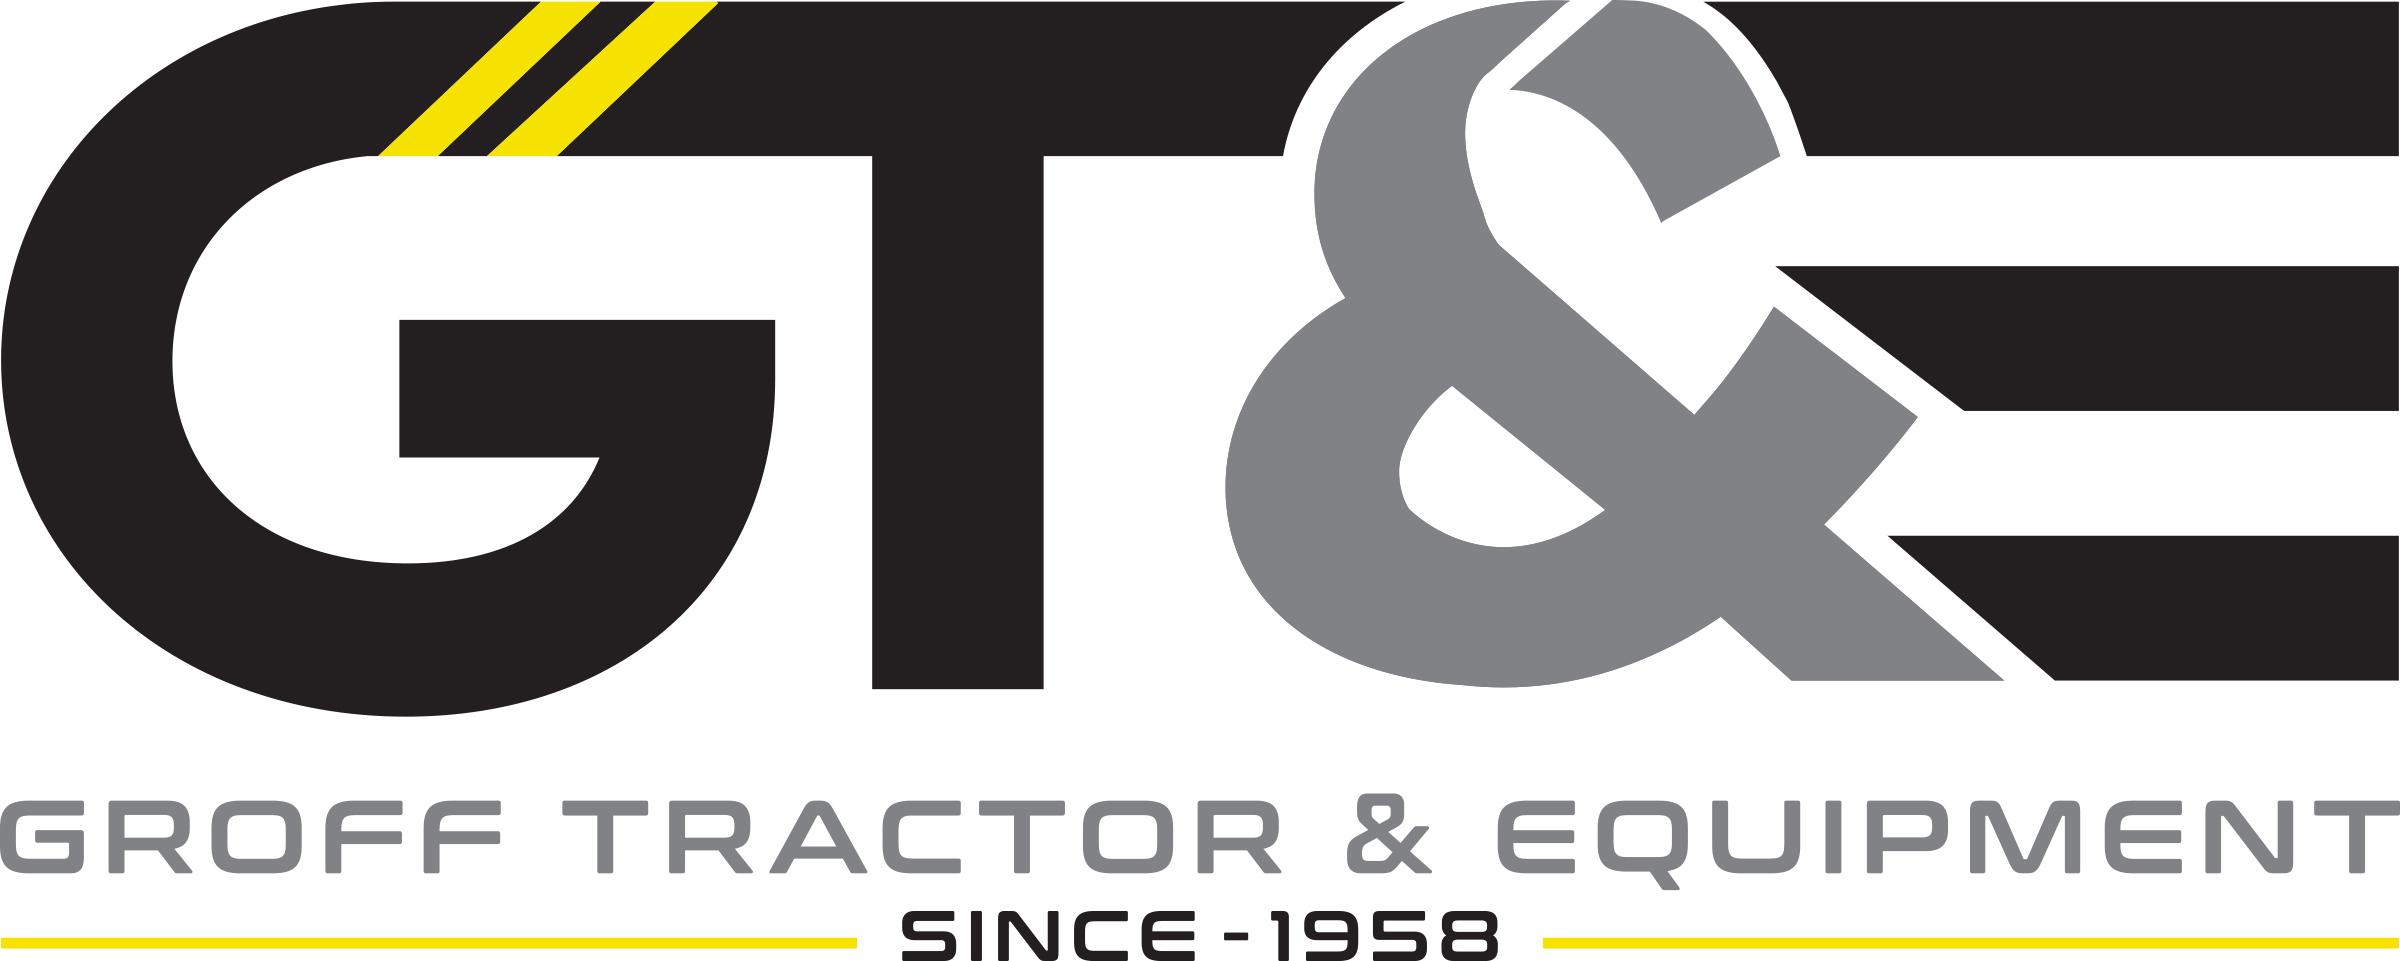 Groff Tractor & Equipment, LLC company logo